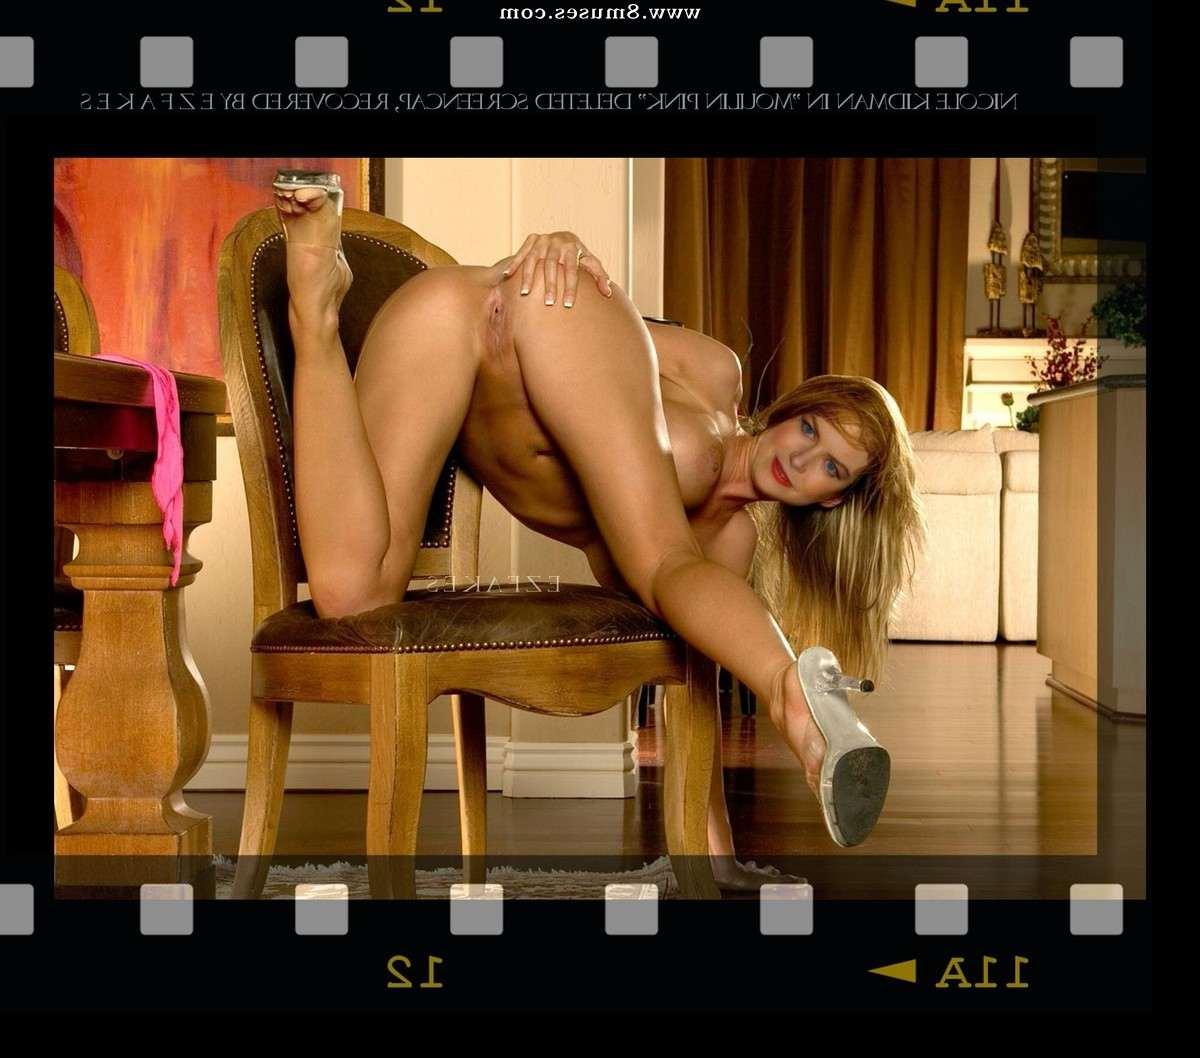 Fake-Celebrities-Sex-Pictures/Nicole-Kidman Nicole_Kidman__8muses_-_Sex_and_Porn_Comics_615.jpg